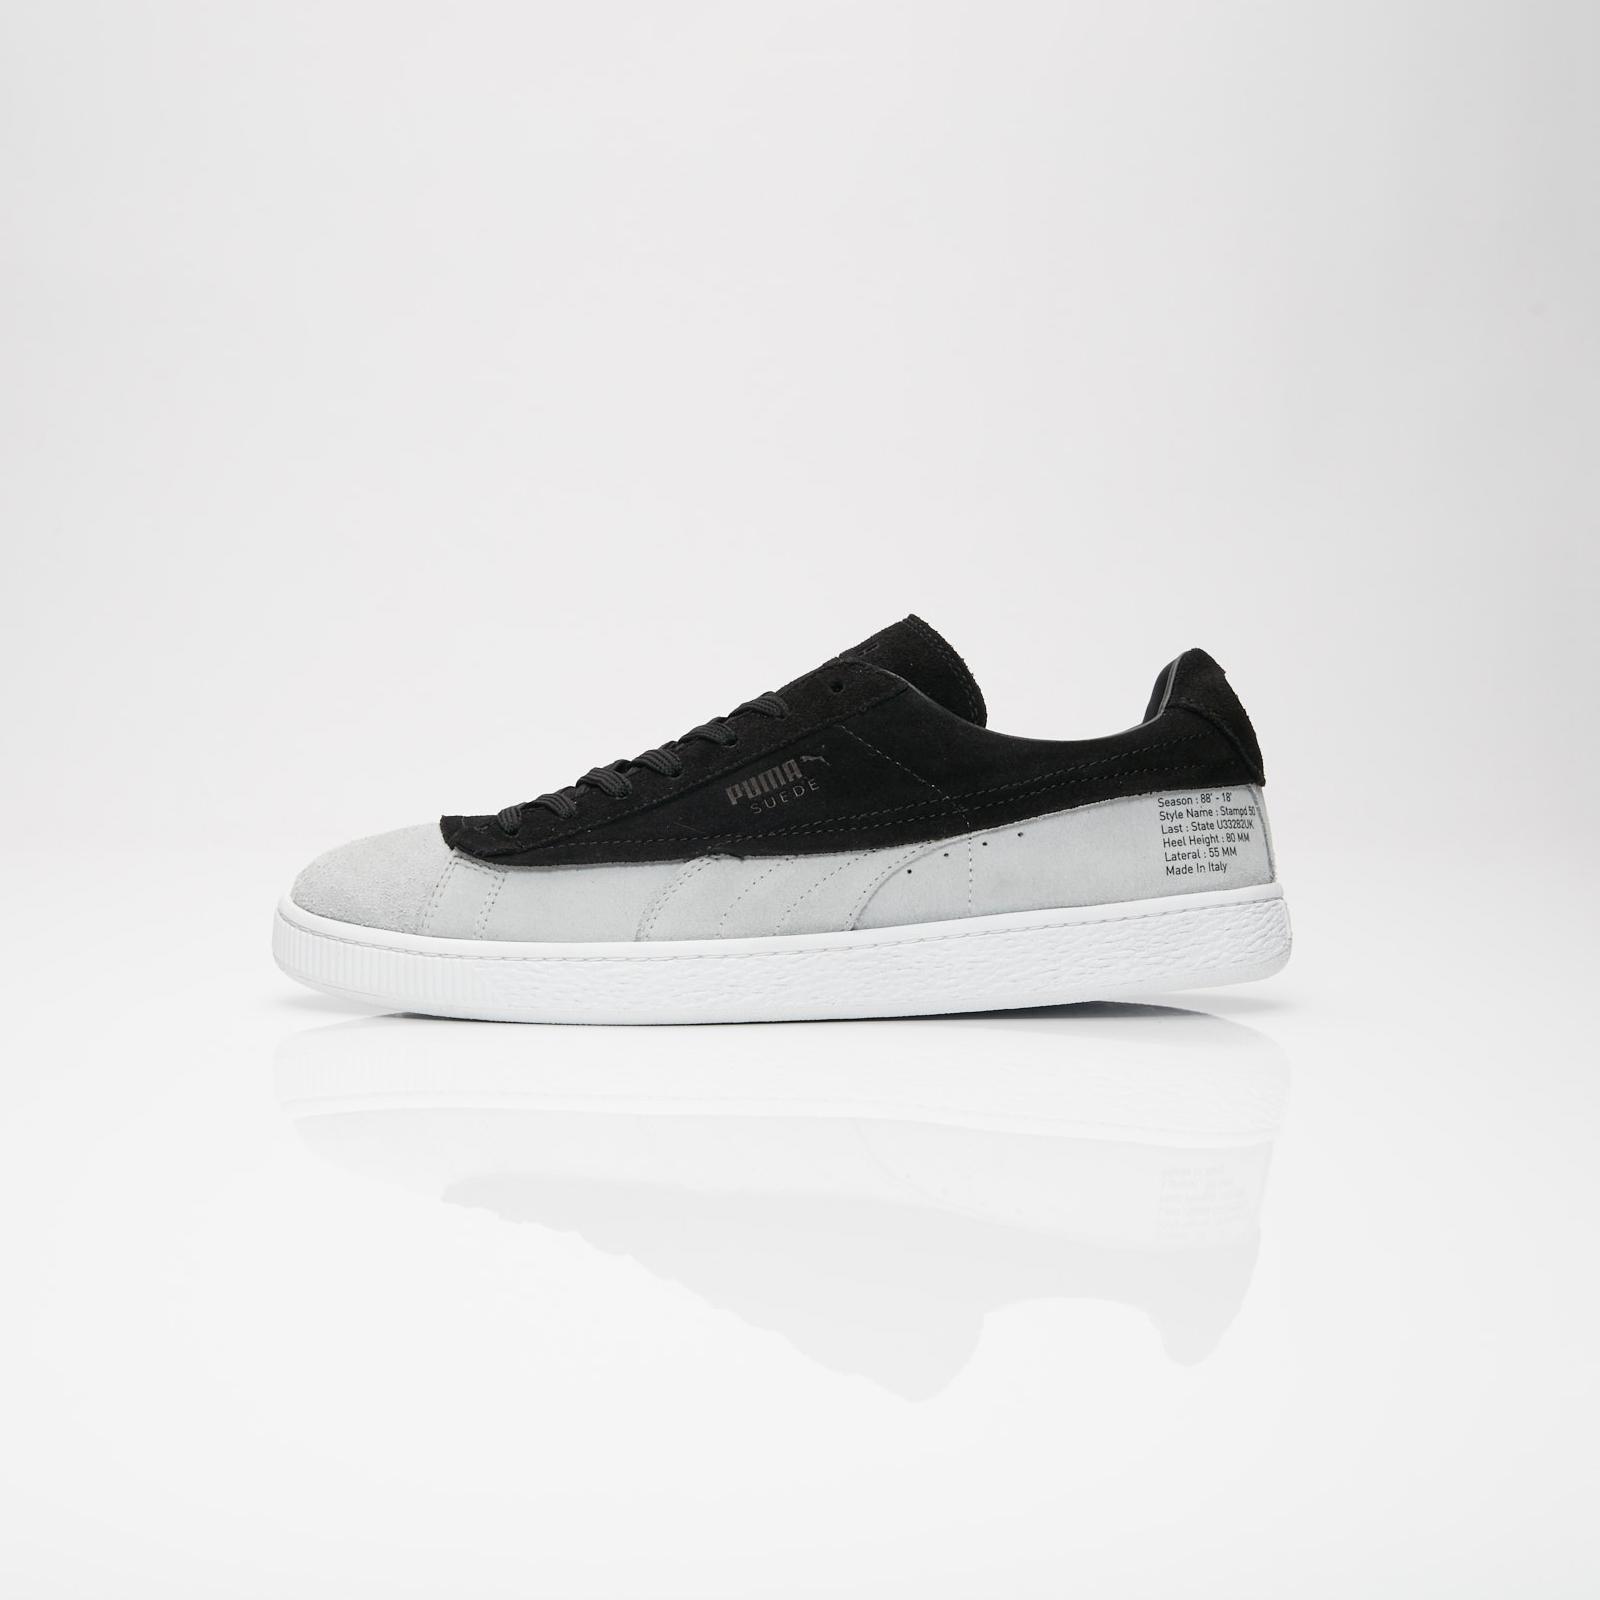 Puma Suede Classic x Stampd - 366327-01 - Sneakersnstuff  ea0e8efc6